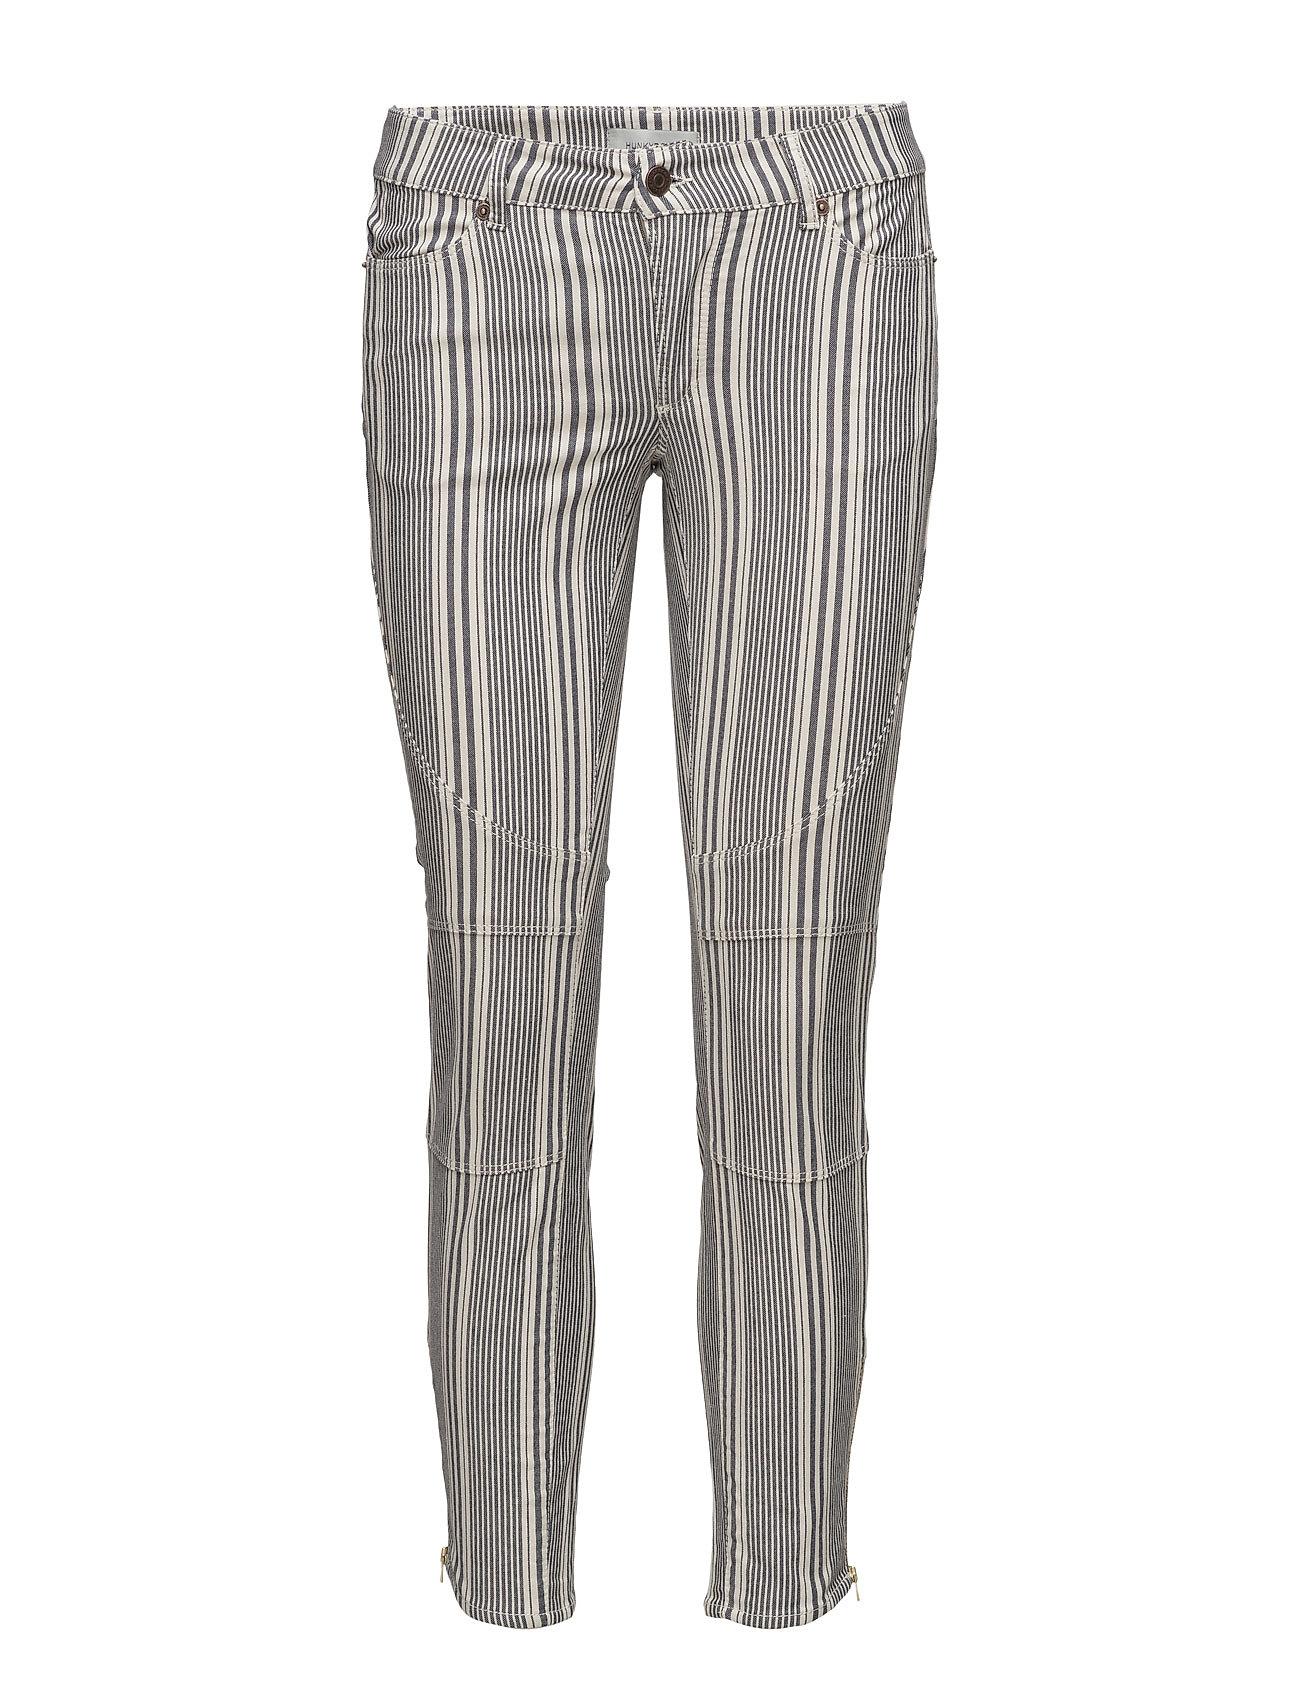 Billy Striped Pant Hunkydory Skinny til Damer i